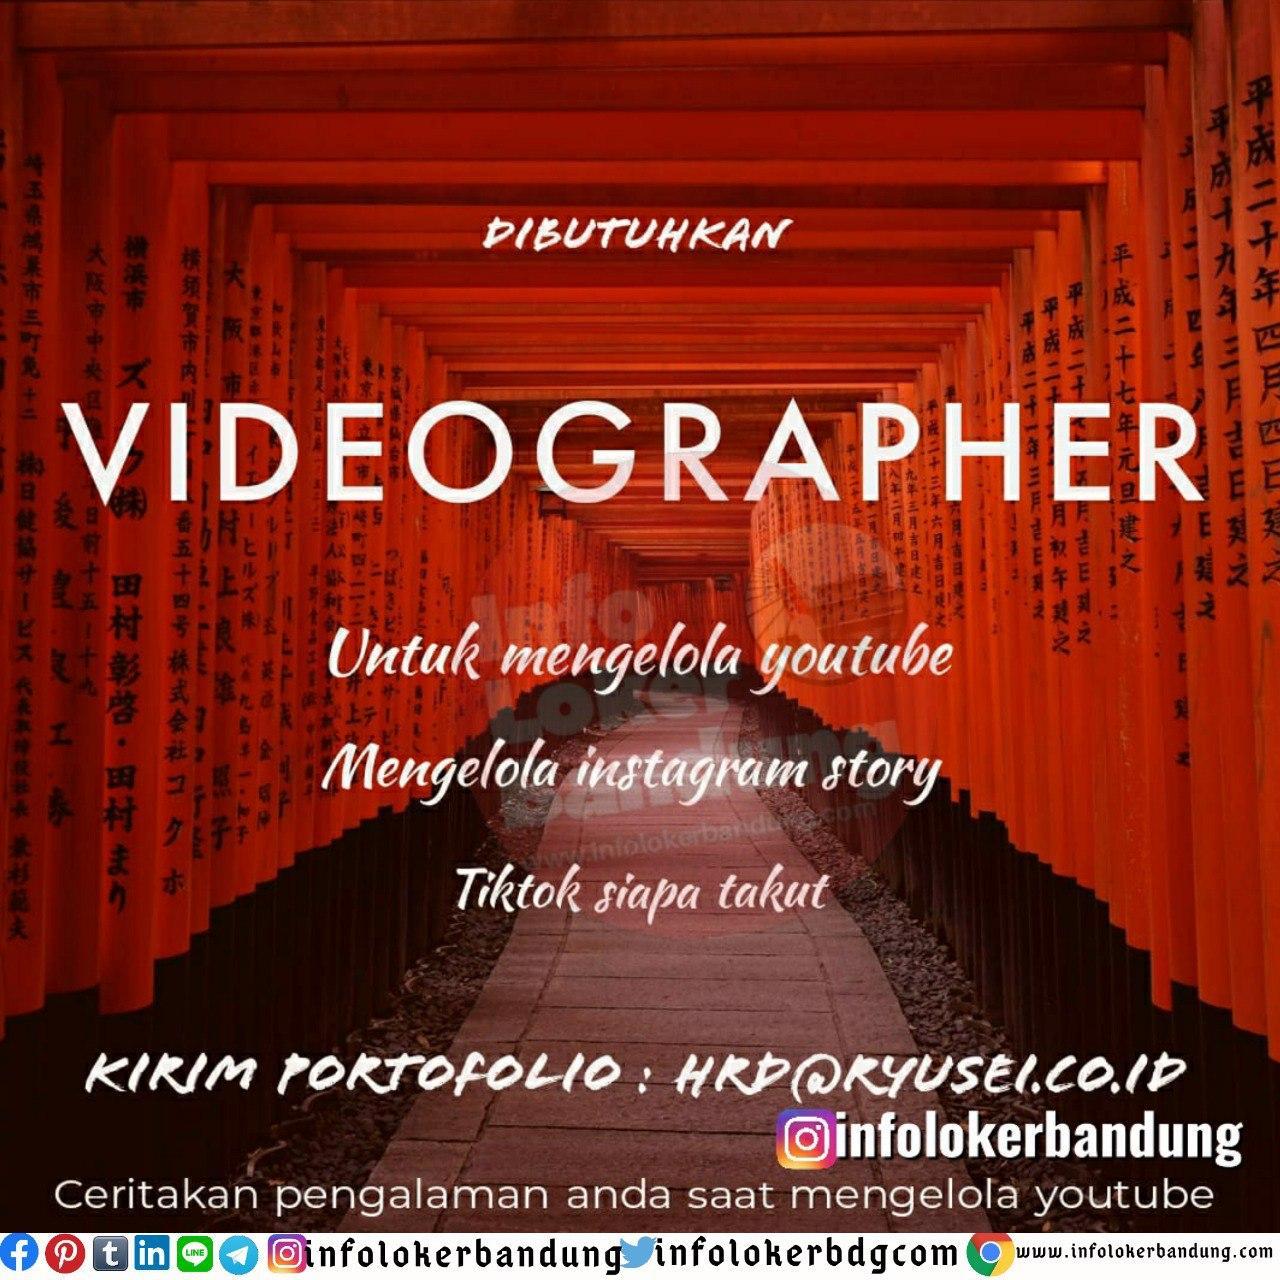 Lowongan Kerja Videographer Ryusei Bandung Juni 2020